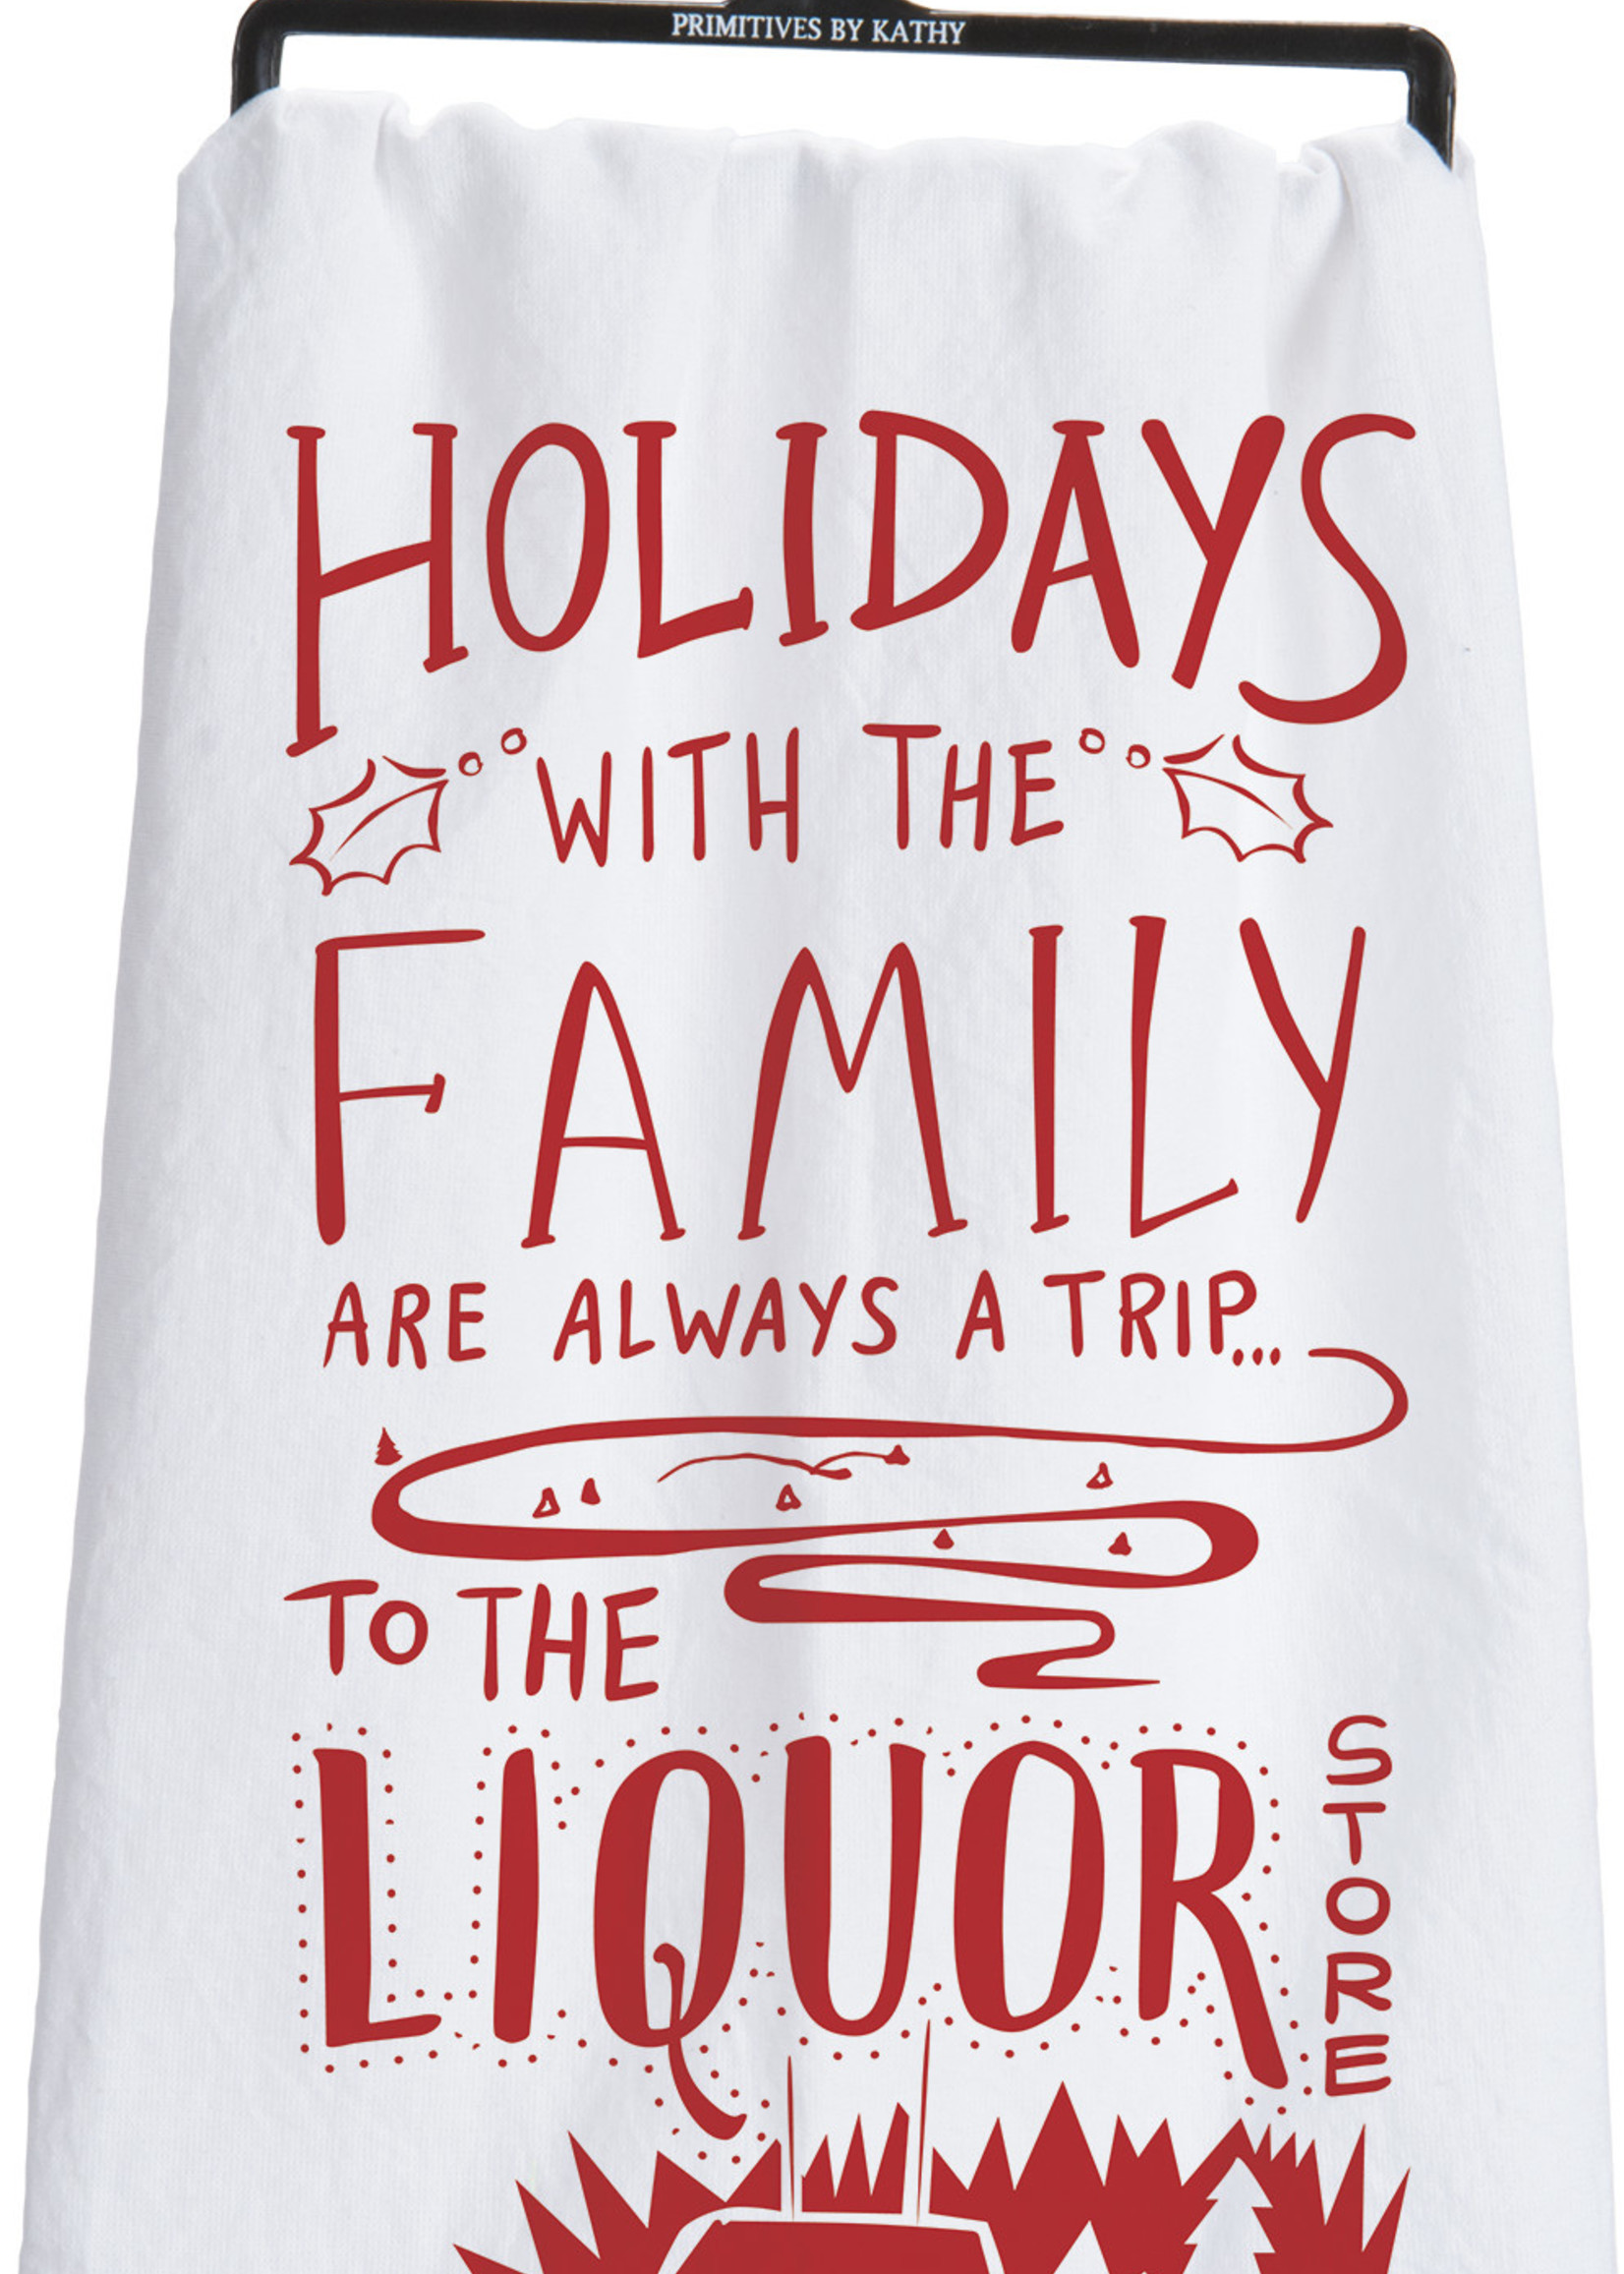 Primitives By Kathy Dish Towel - Liquor Store